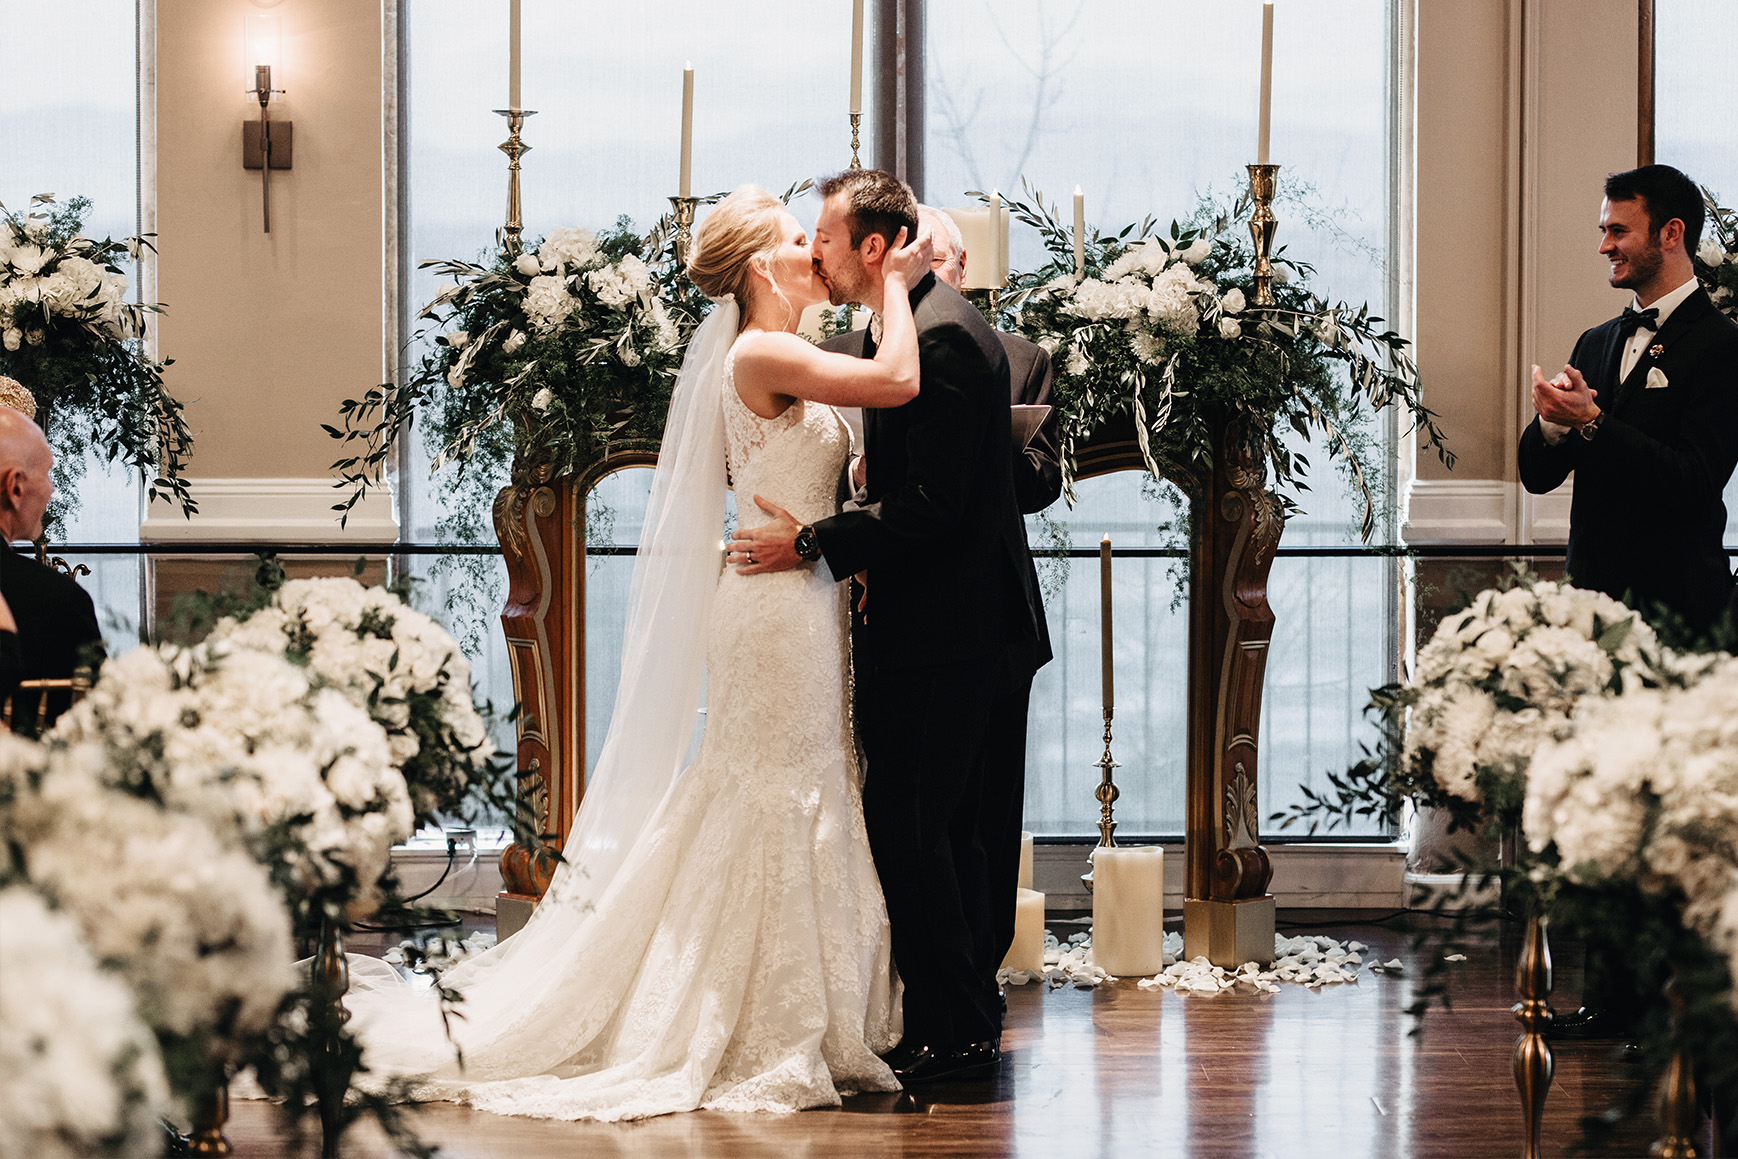 Beautiful Indoor Ceremonies - Brittany Hill - Thornton, Colorado - Adams County - Weld County - Wedgewood Weddings